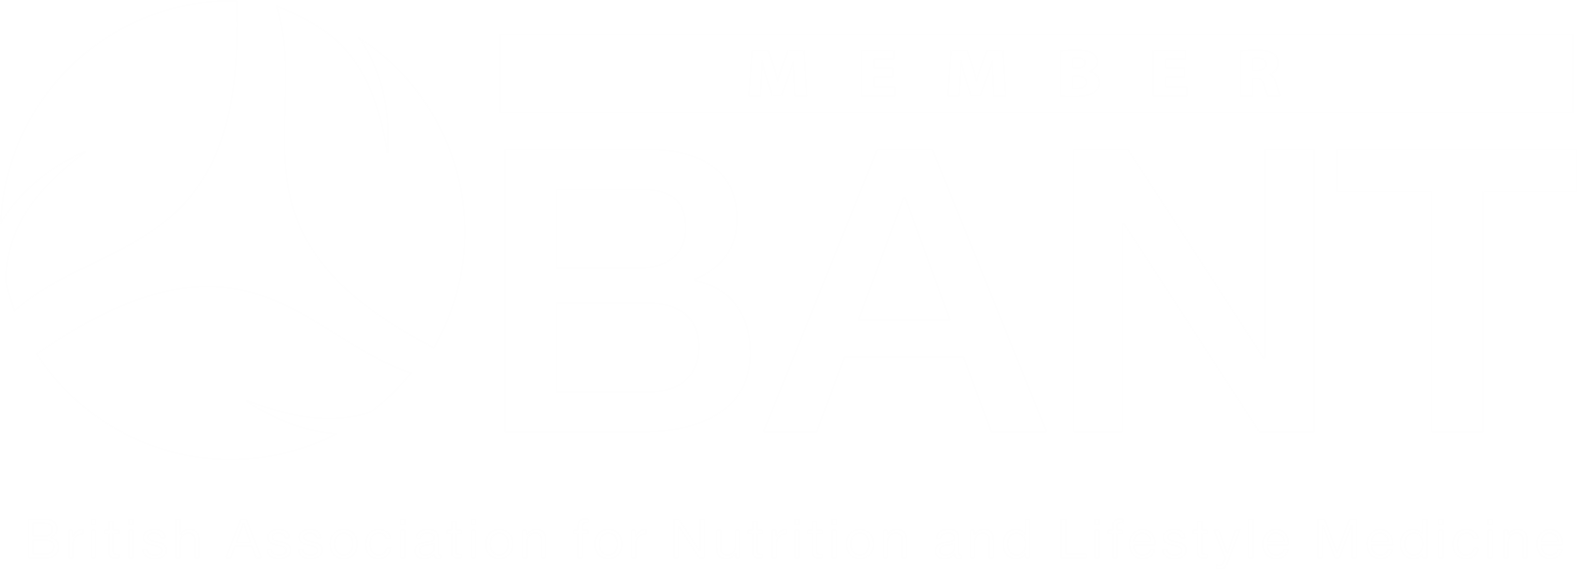 BANT_MEMBER_Logo_WHITE.png